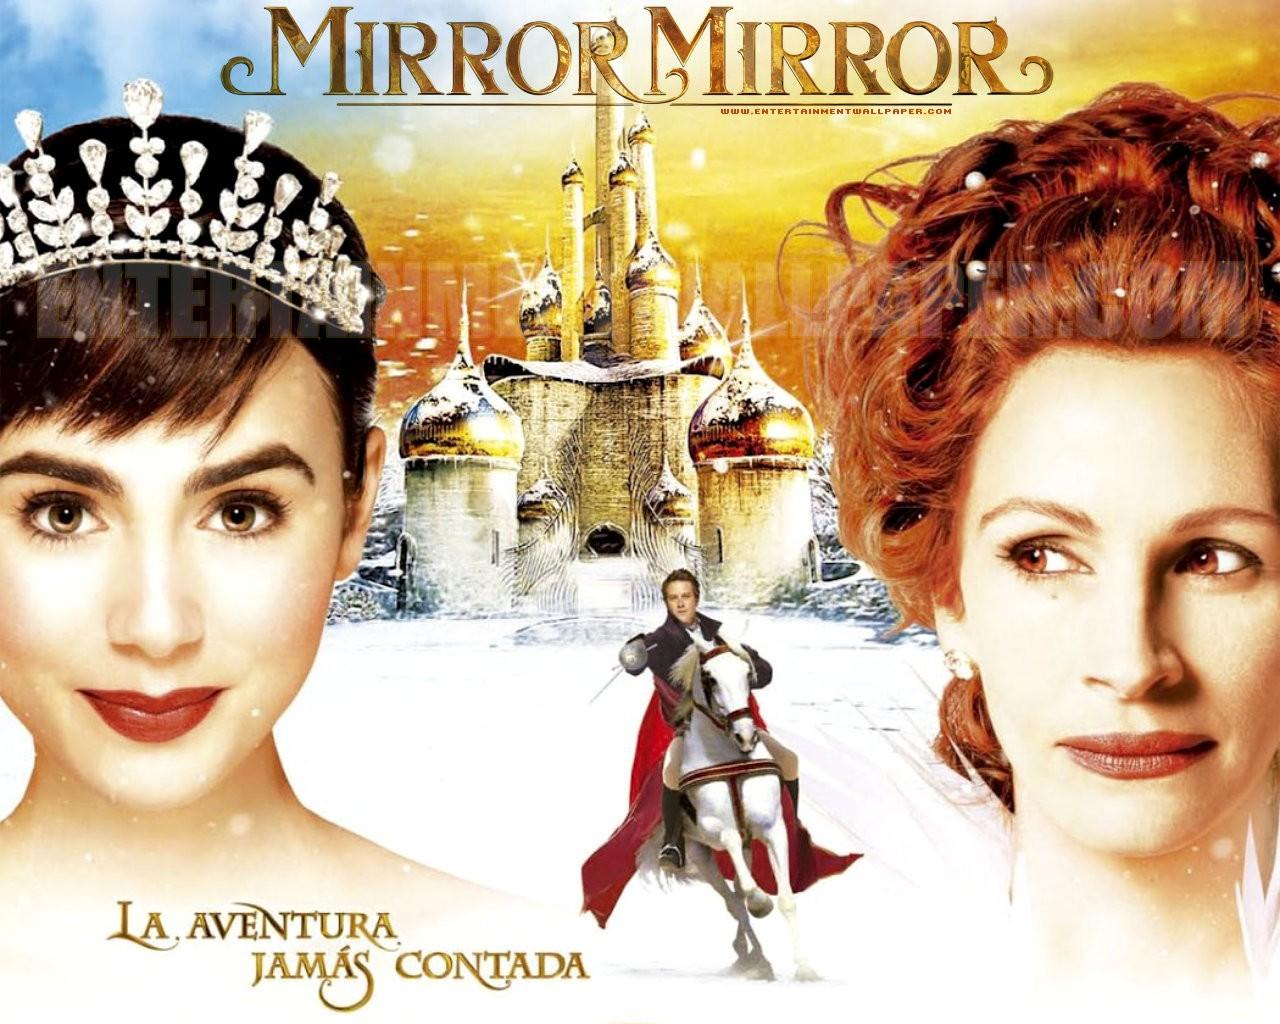 Mirror Mirror - Mirror Mirror Wallpaper (30450970) - Fanpop